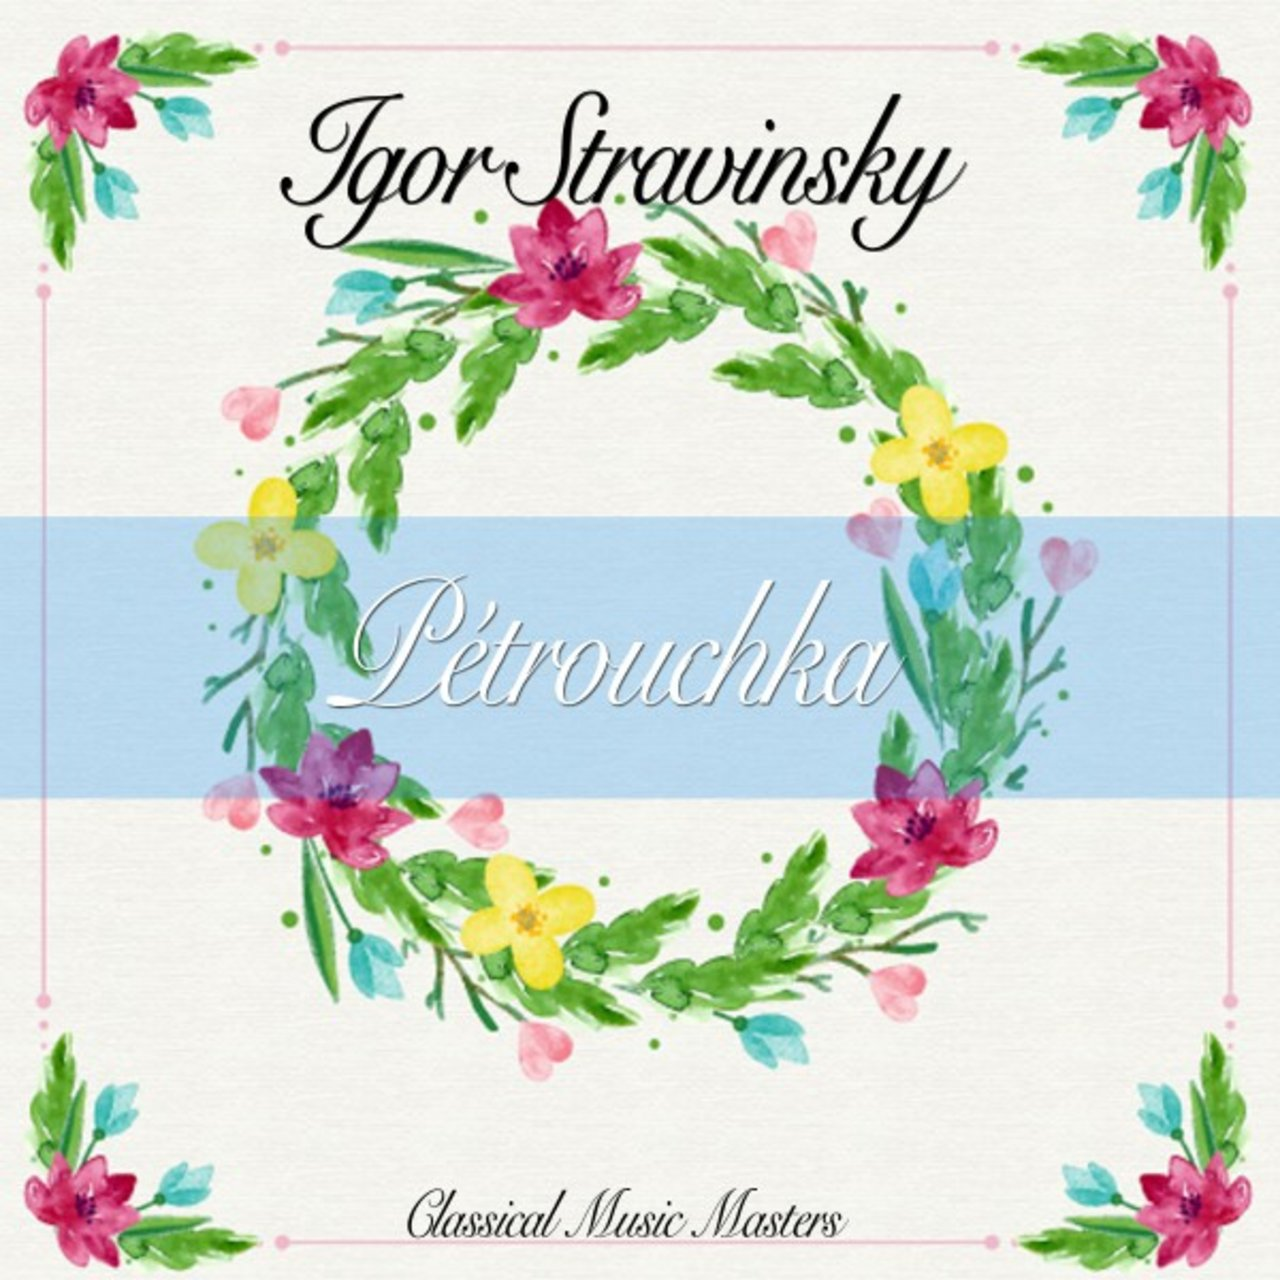 Tidal listen to igor stravinsky on tidal ptrouchka classical music masters m4hsunfo